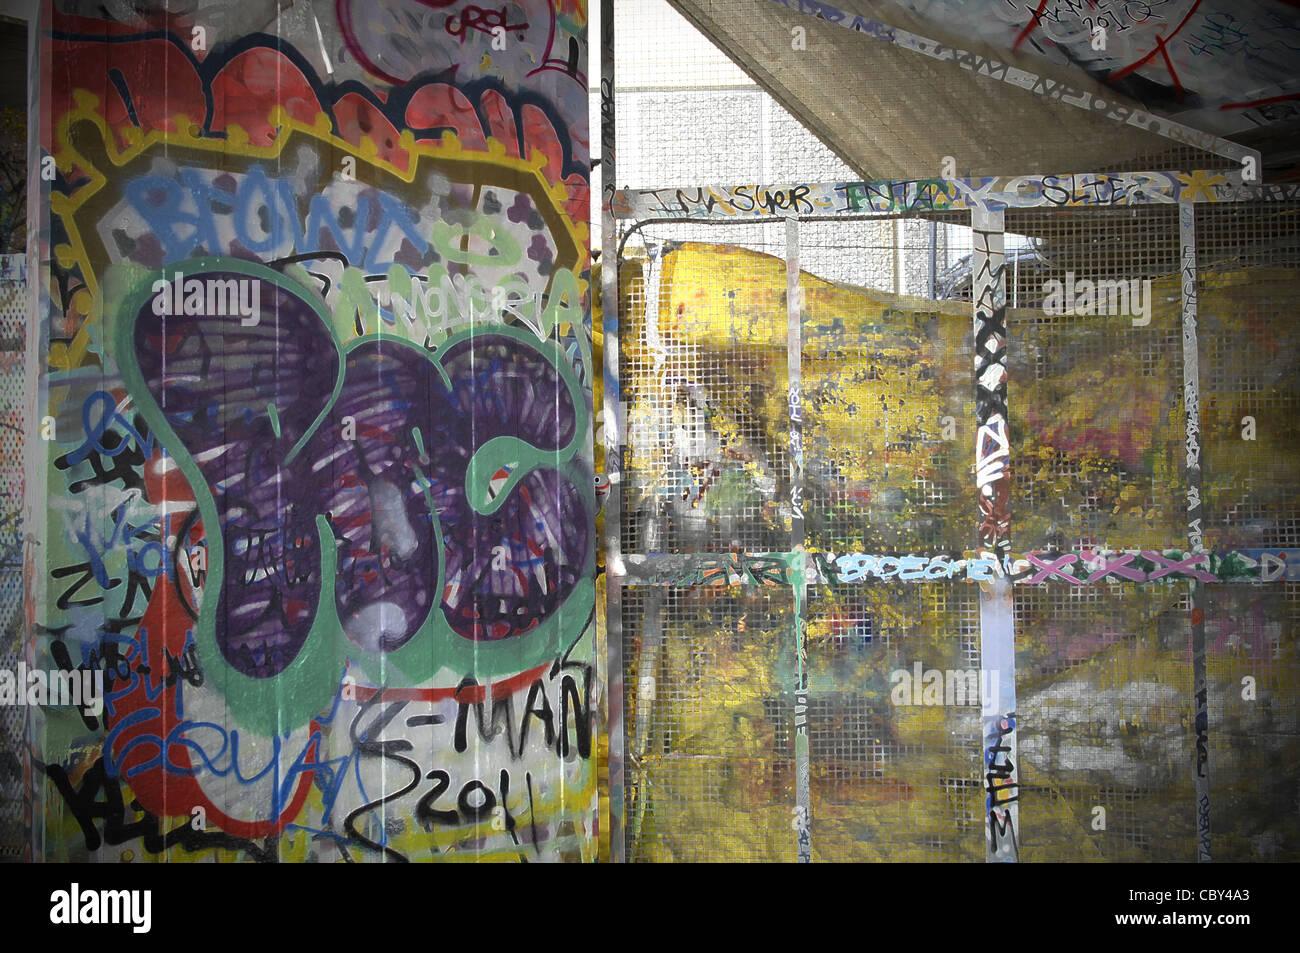 Vibrant graffiti on concrete wall on south bank of river thames central london graffiti